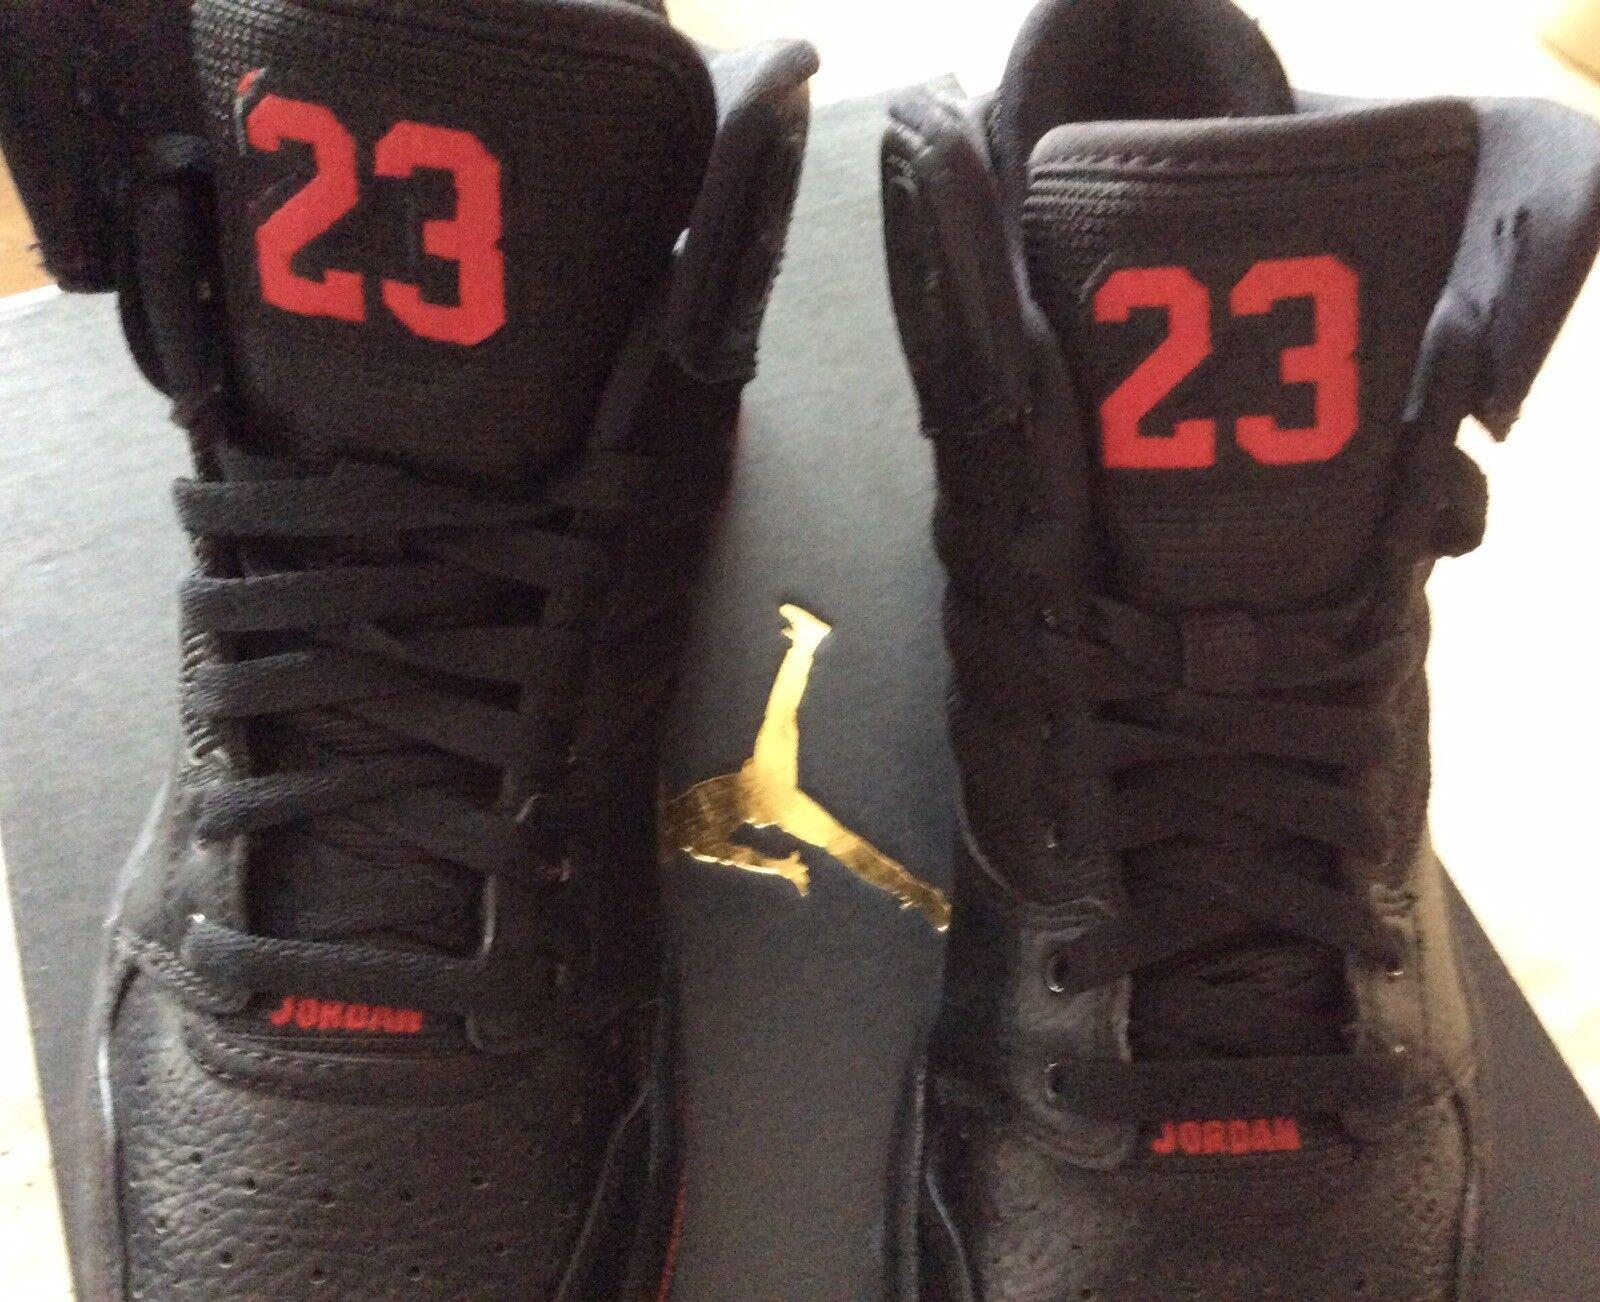 Jordan's 1 Flight 4 Premium Nike